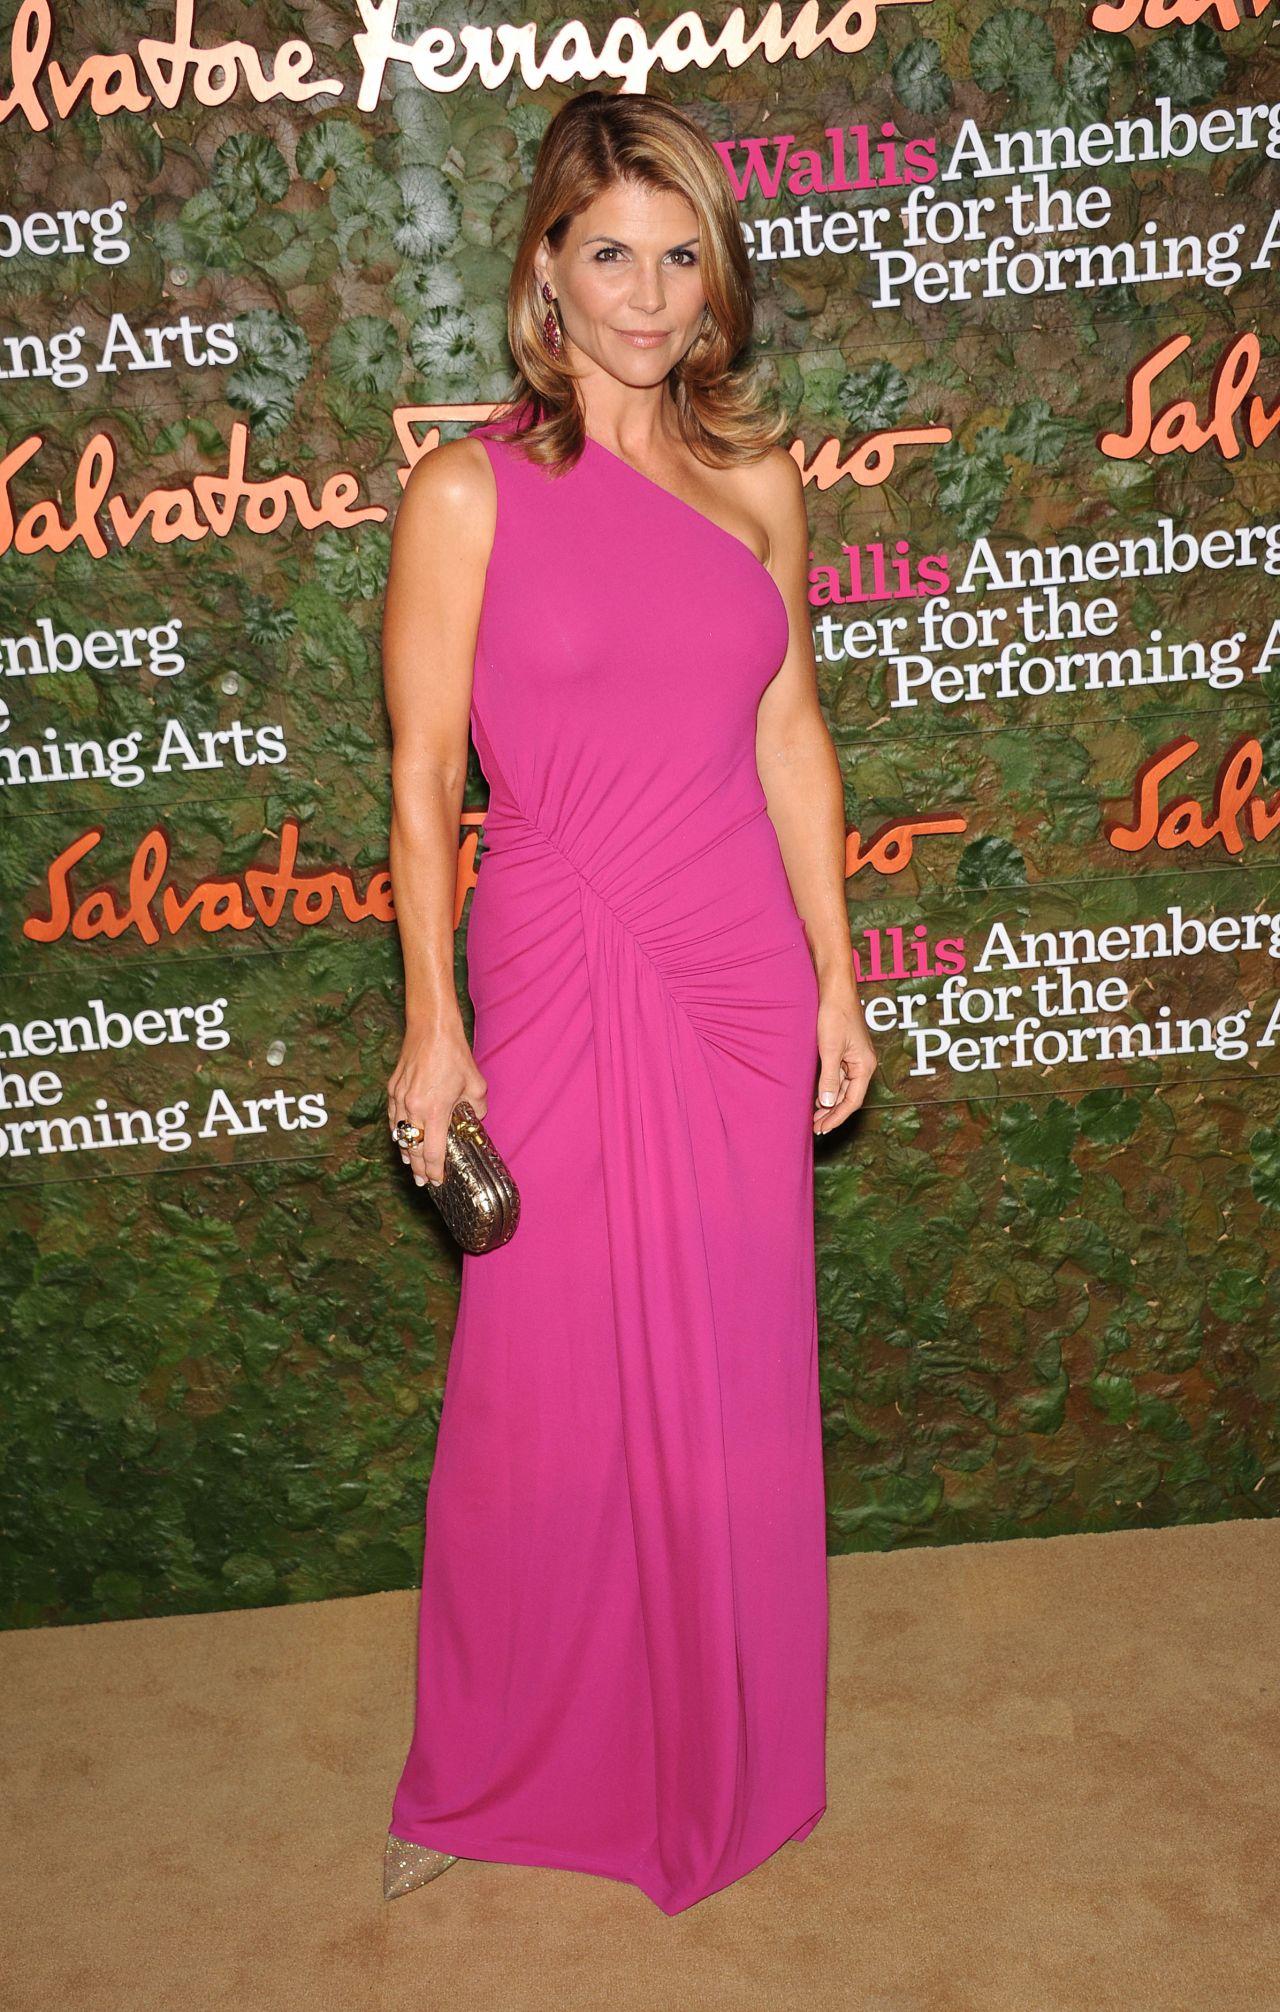 Lori Loughlin at Wallis Annenberg Center Gala